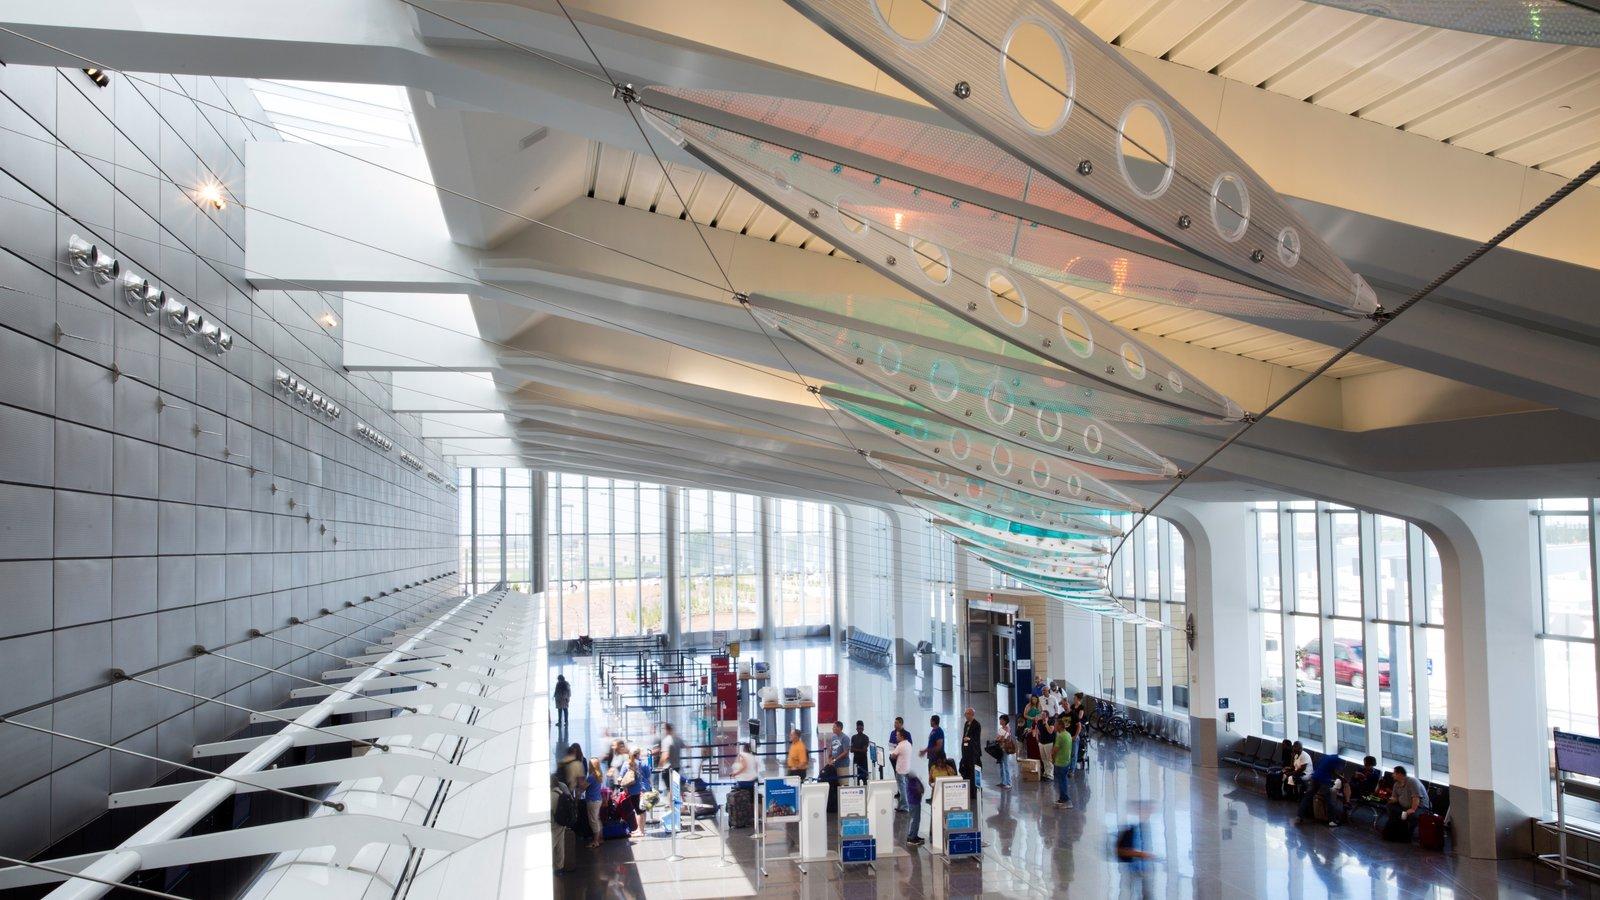 Wichita caracterizando vistas internas e arquitetura moderna